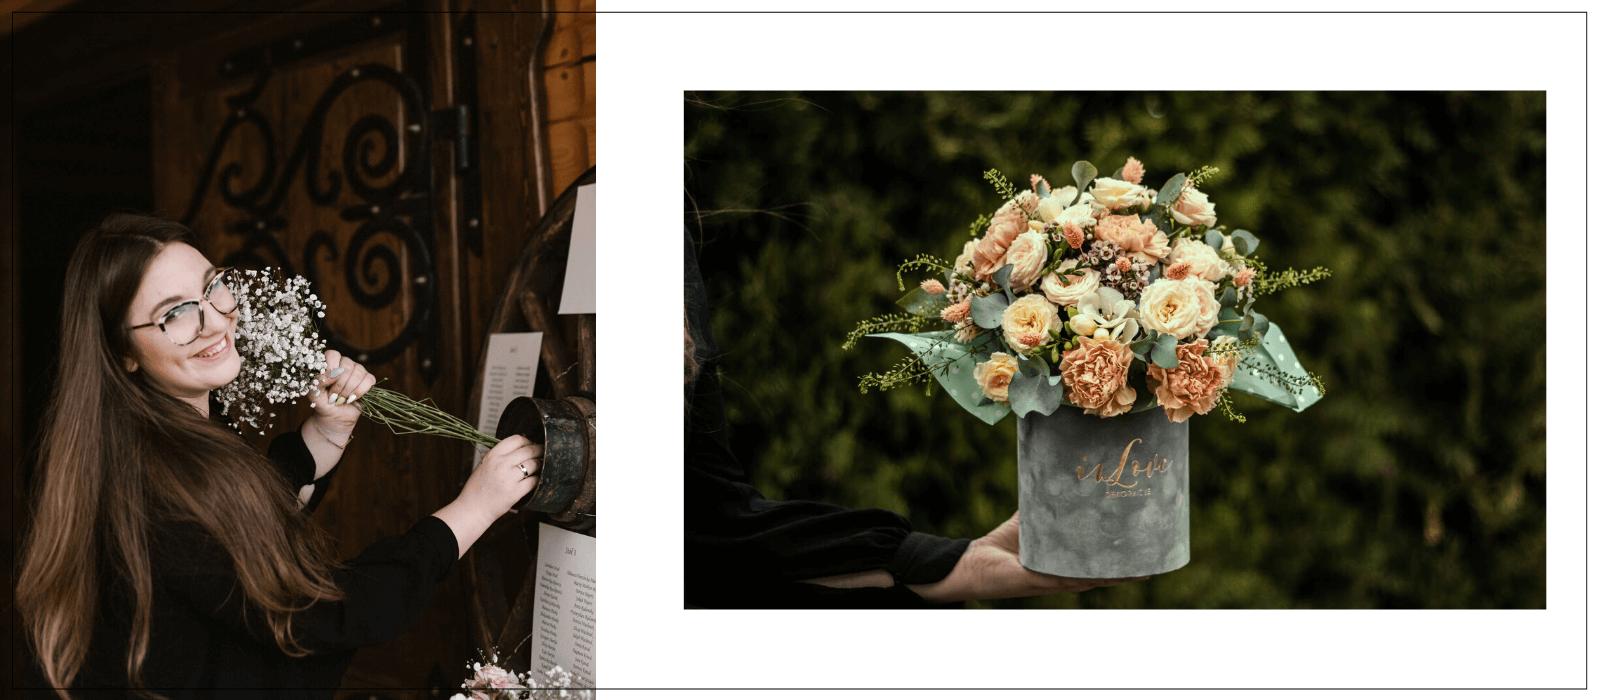 natalia czop dekoracje inlove design your wedding